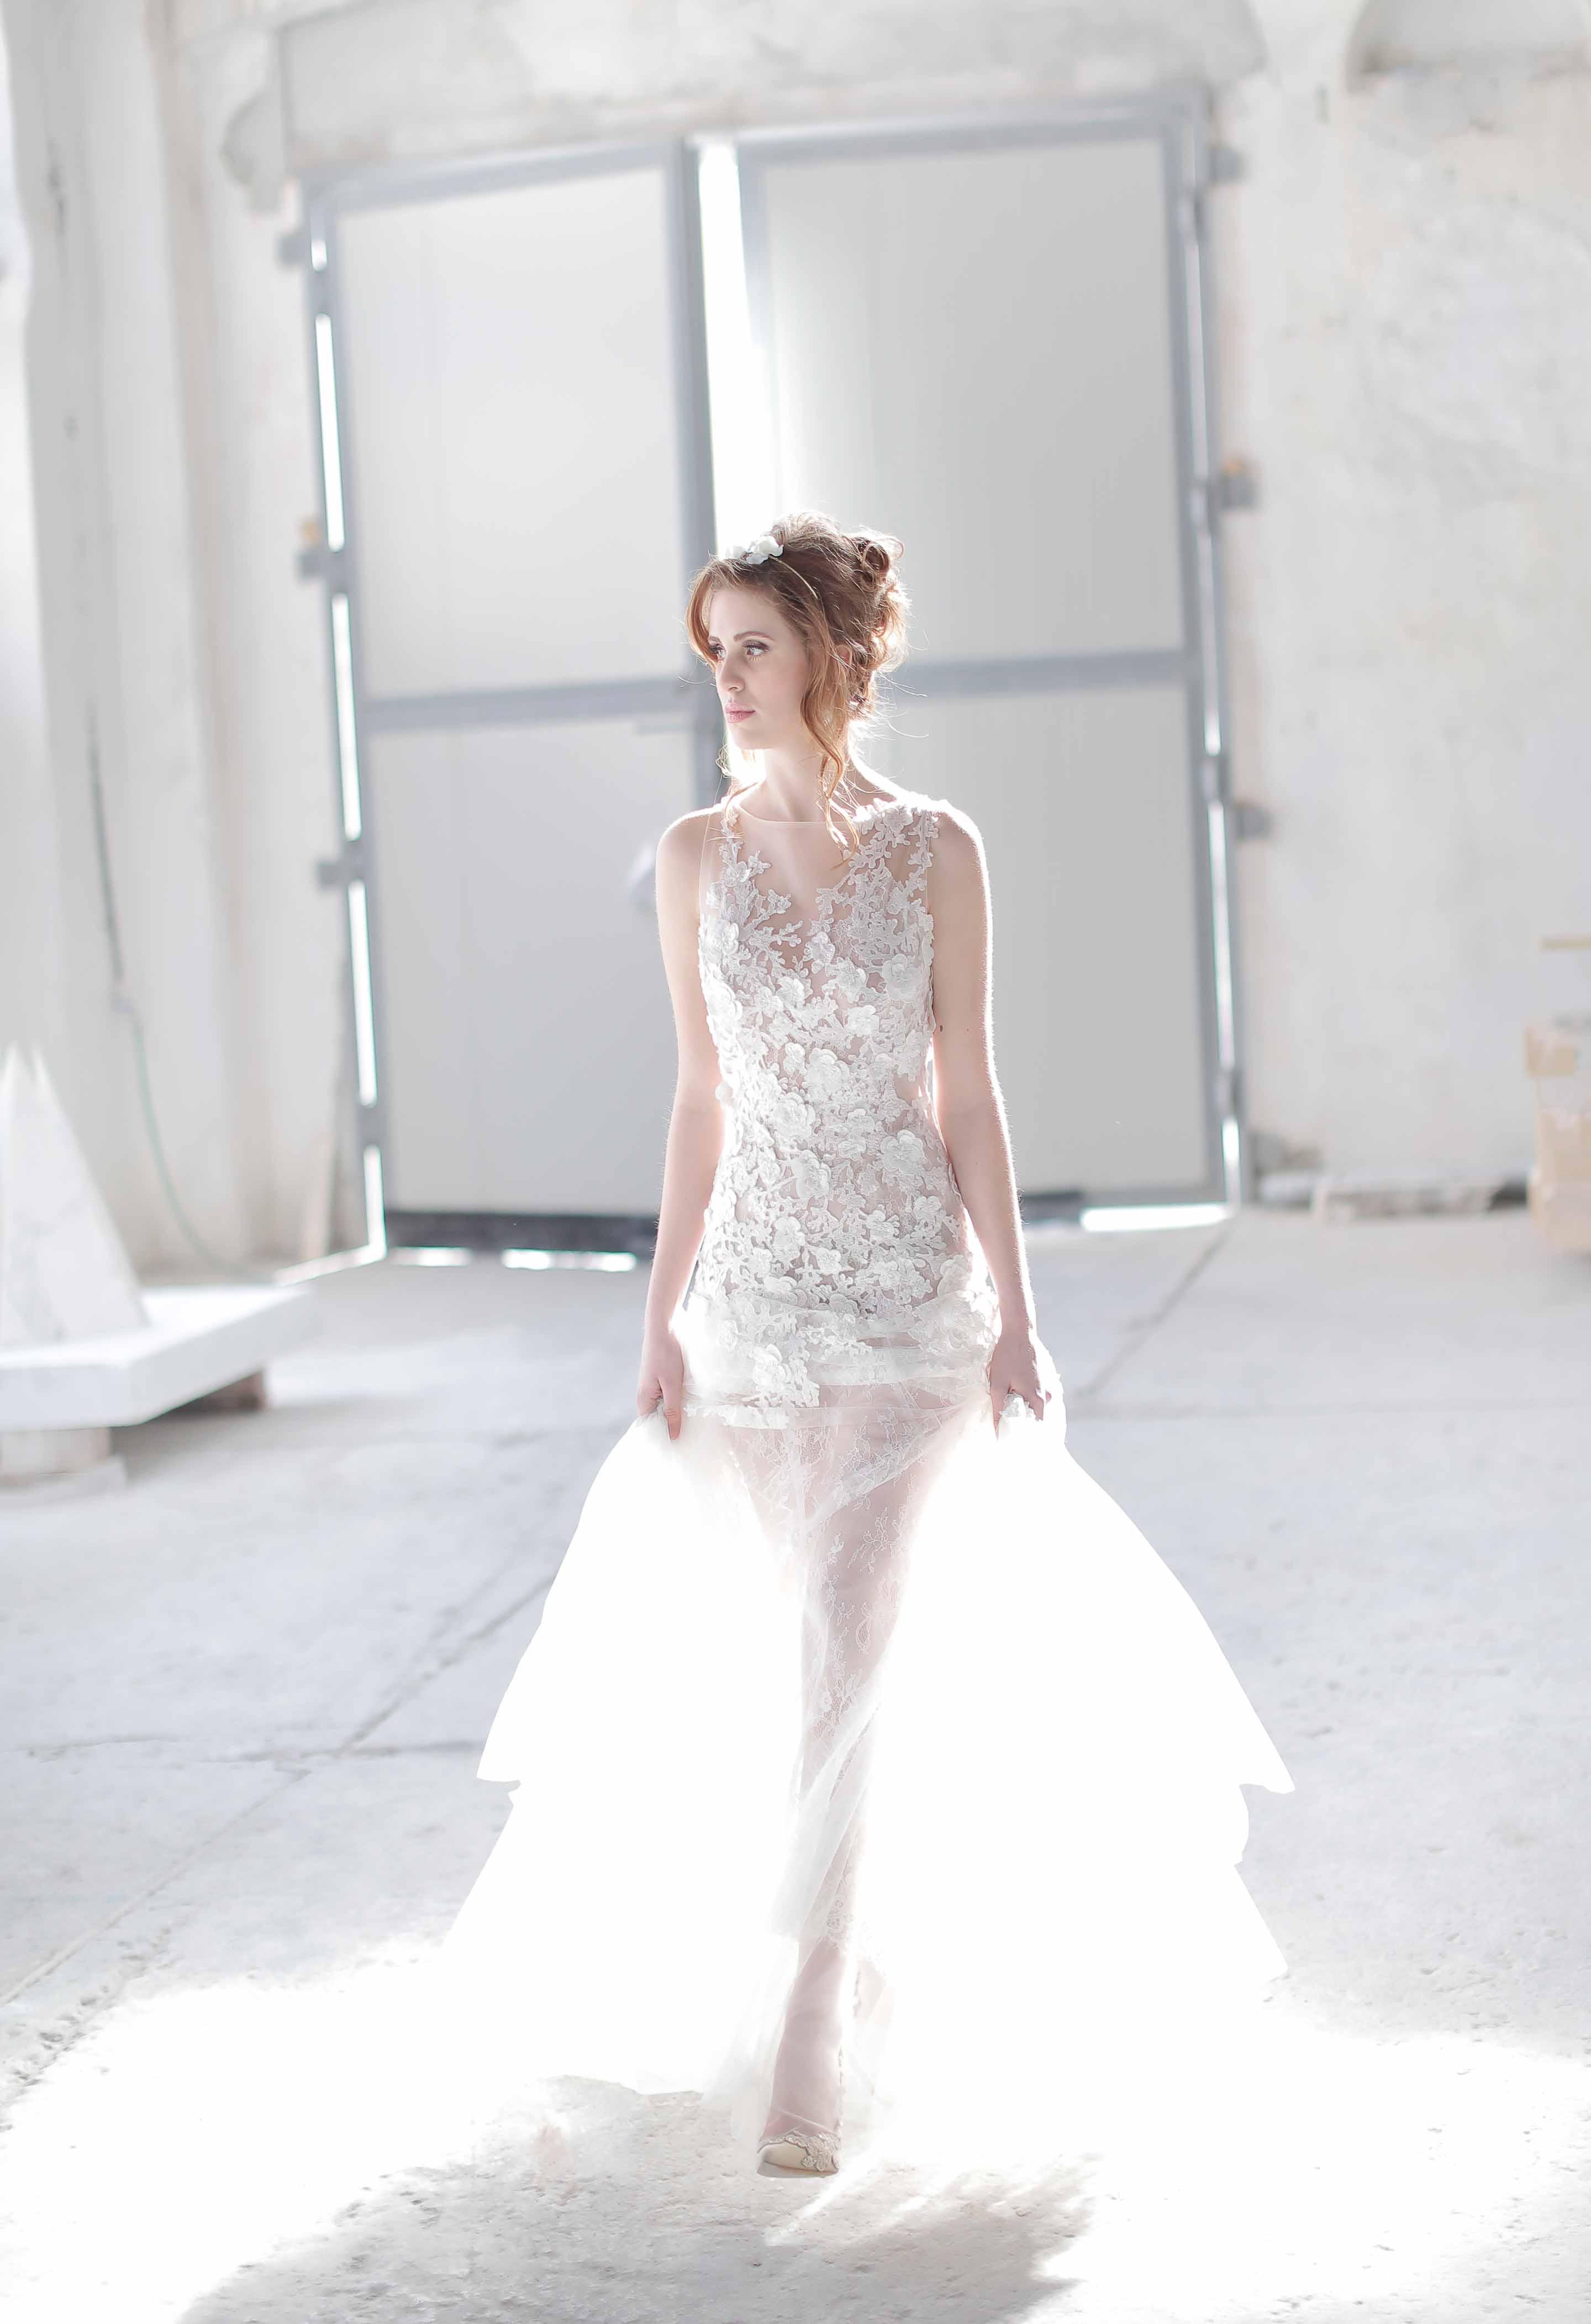 bride walking in a marble studio